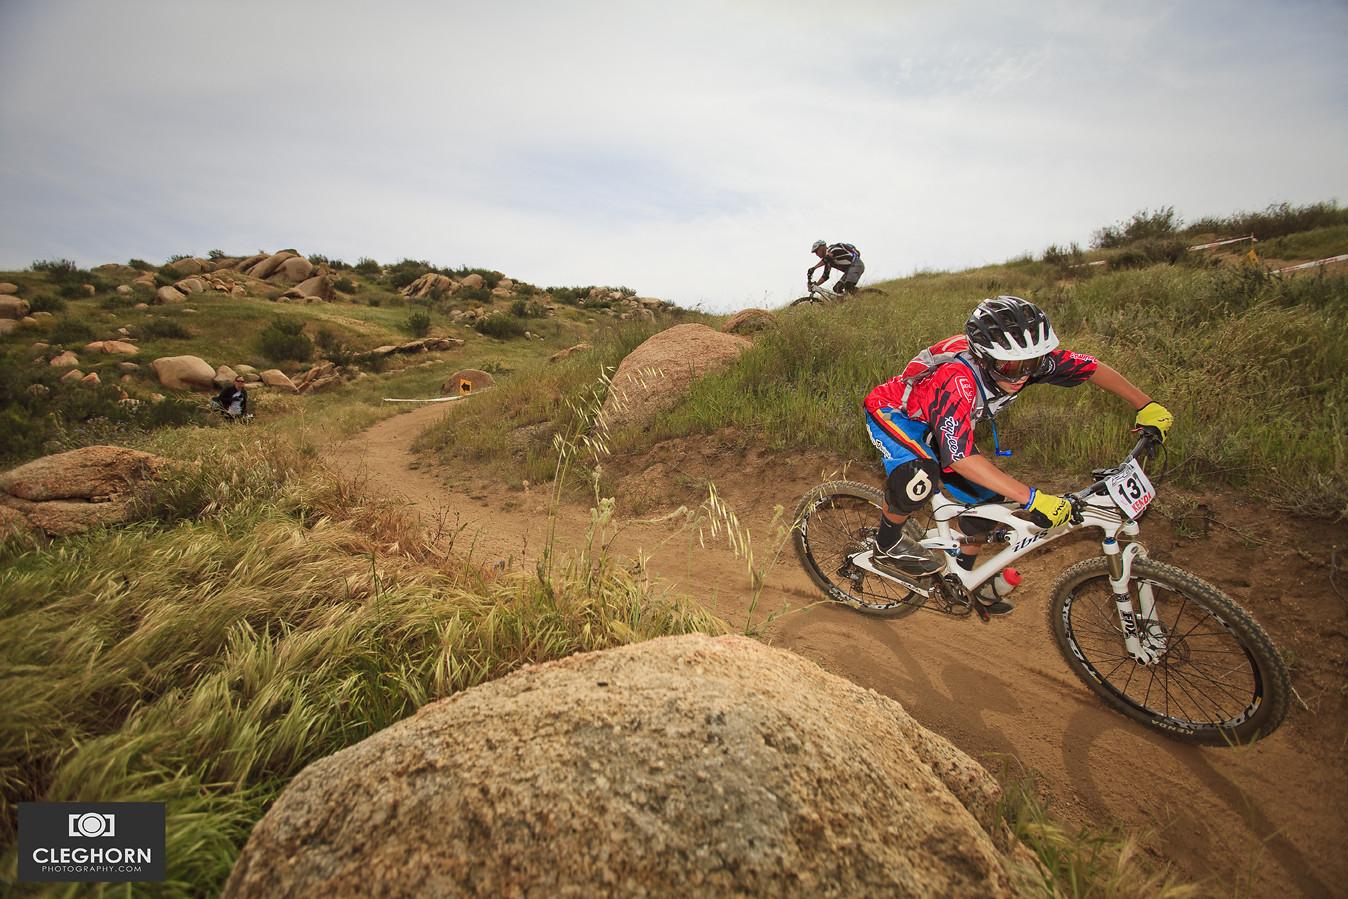 Shredding! - Cleghorn Photography - Mountain Biking Pictures - Vital MTB